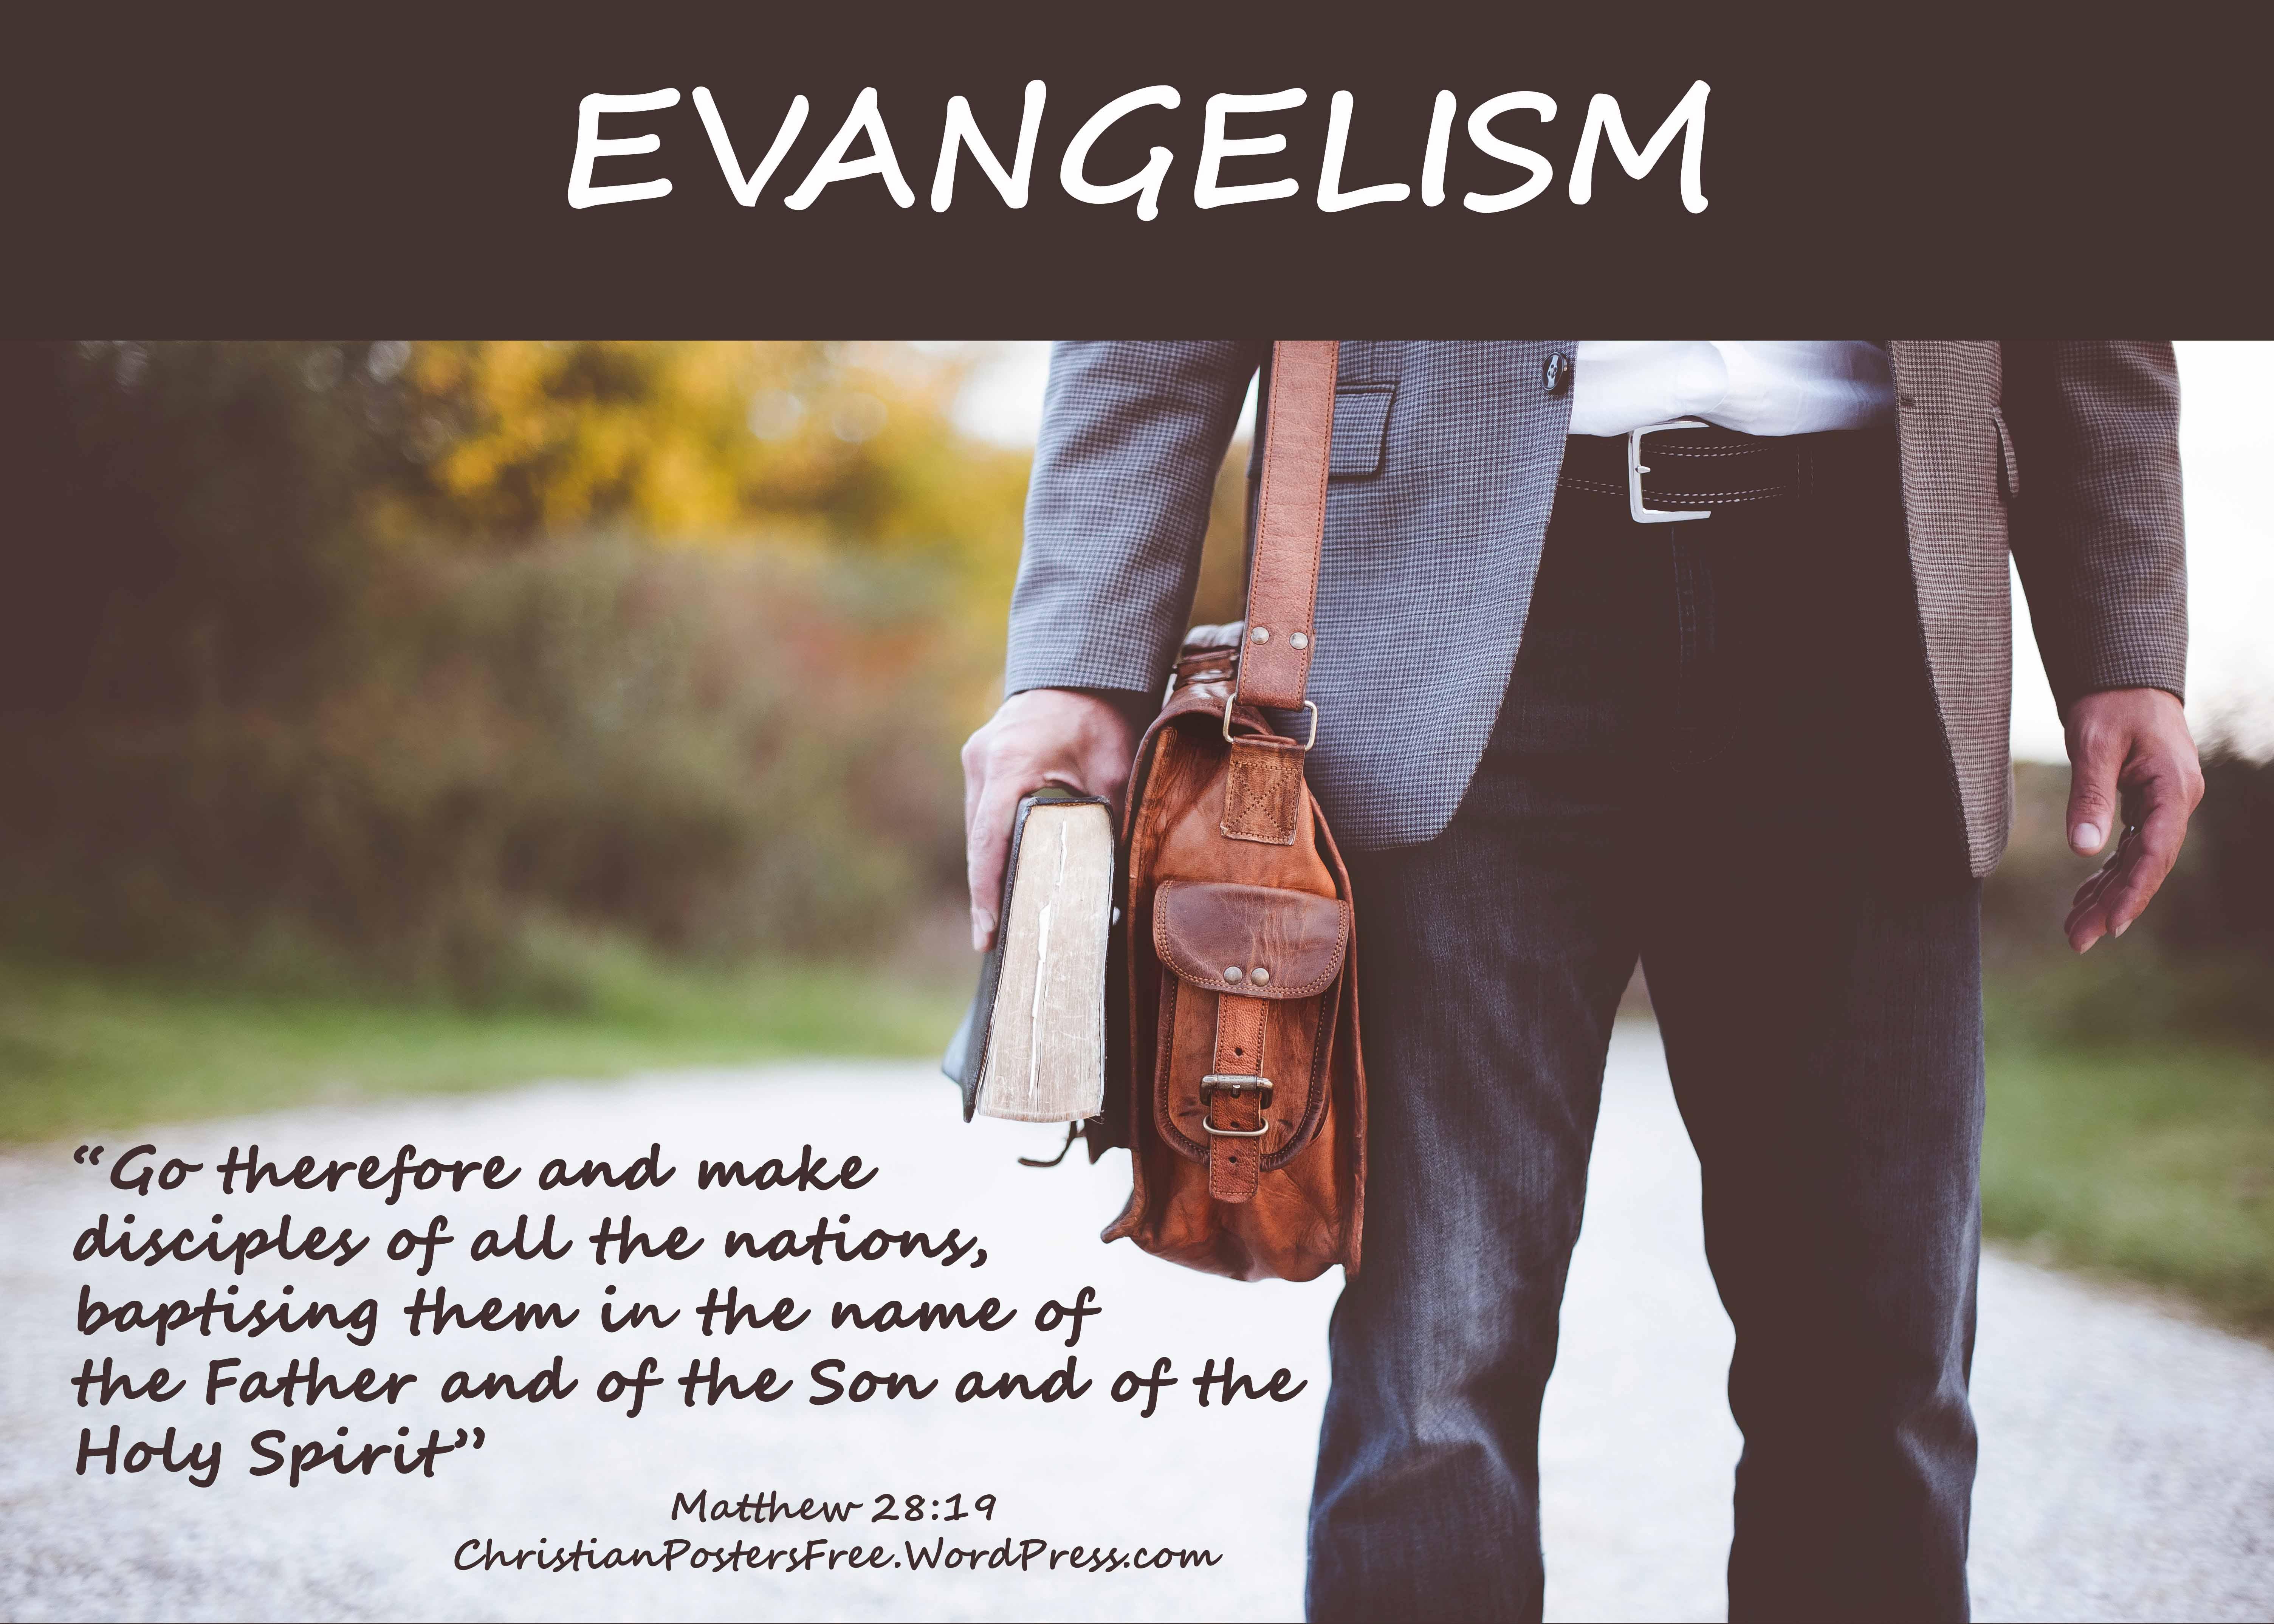 evangelism poster photo ben white on unsplashcom poster david clode